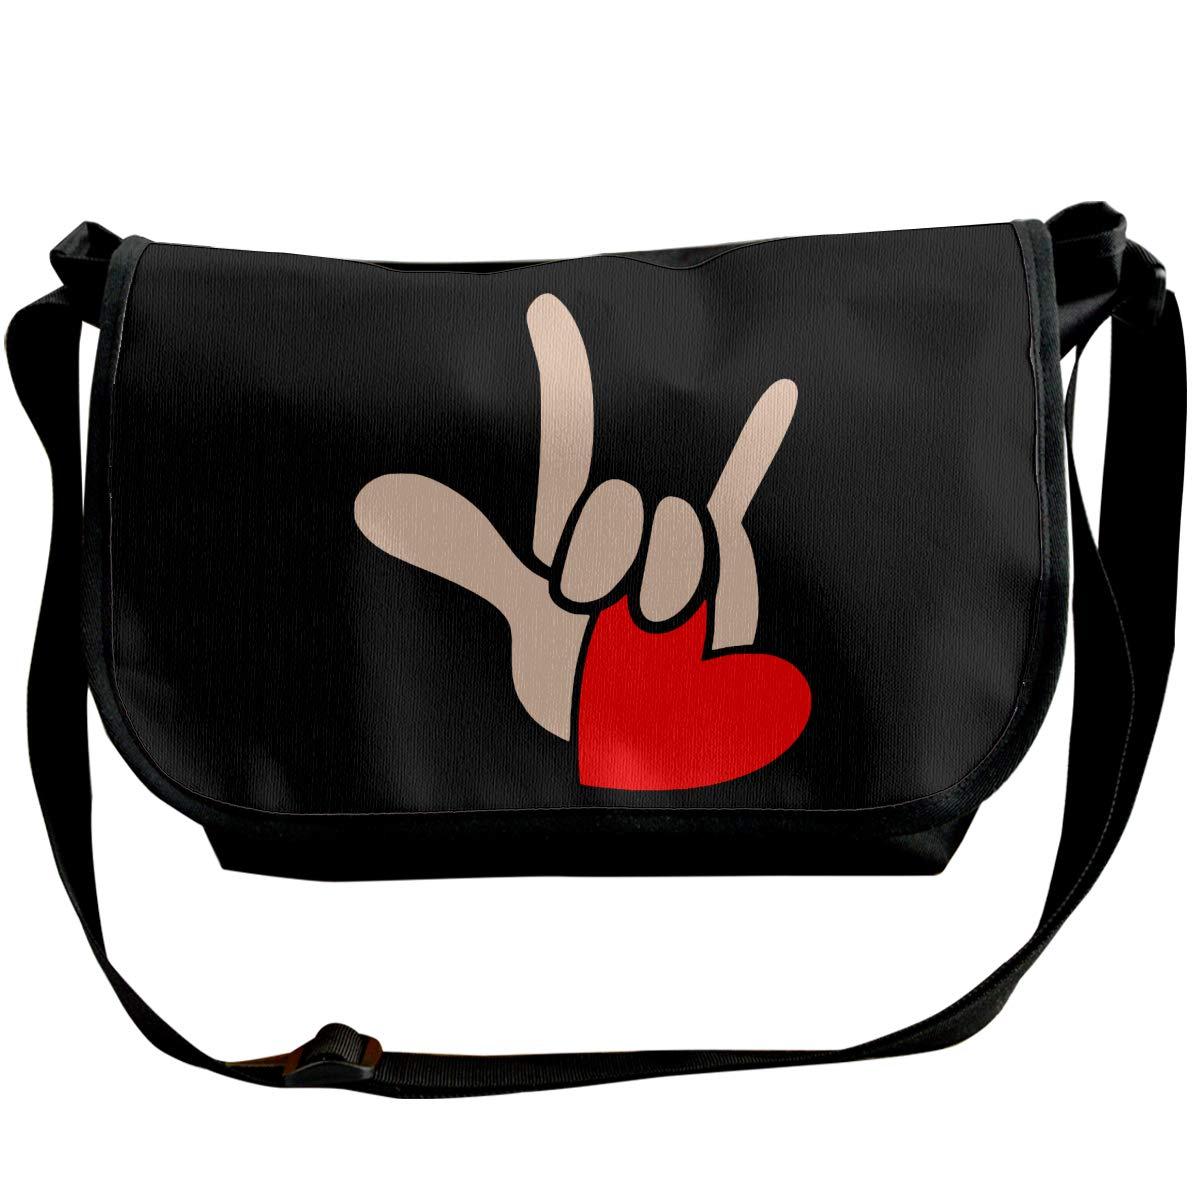 Futong Huaxia ASL I Love You Sign Language Travel Messenger Bags Handbag Shoulder Bag Crossbody Bag Unisex